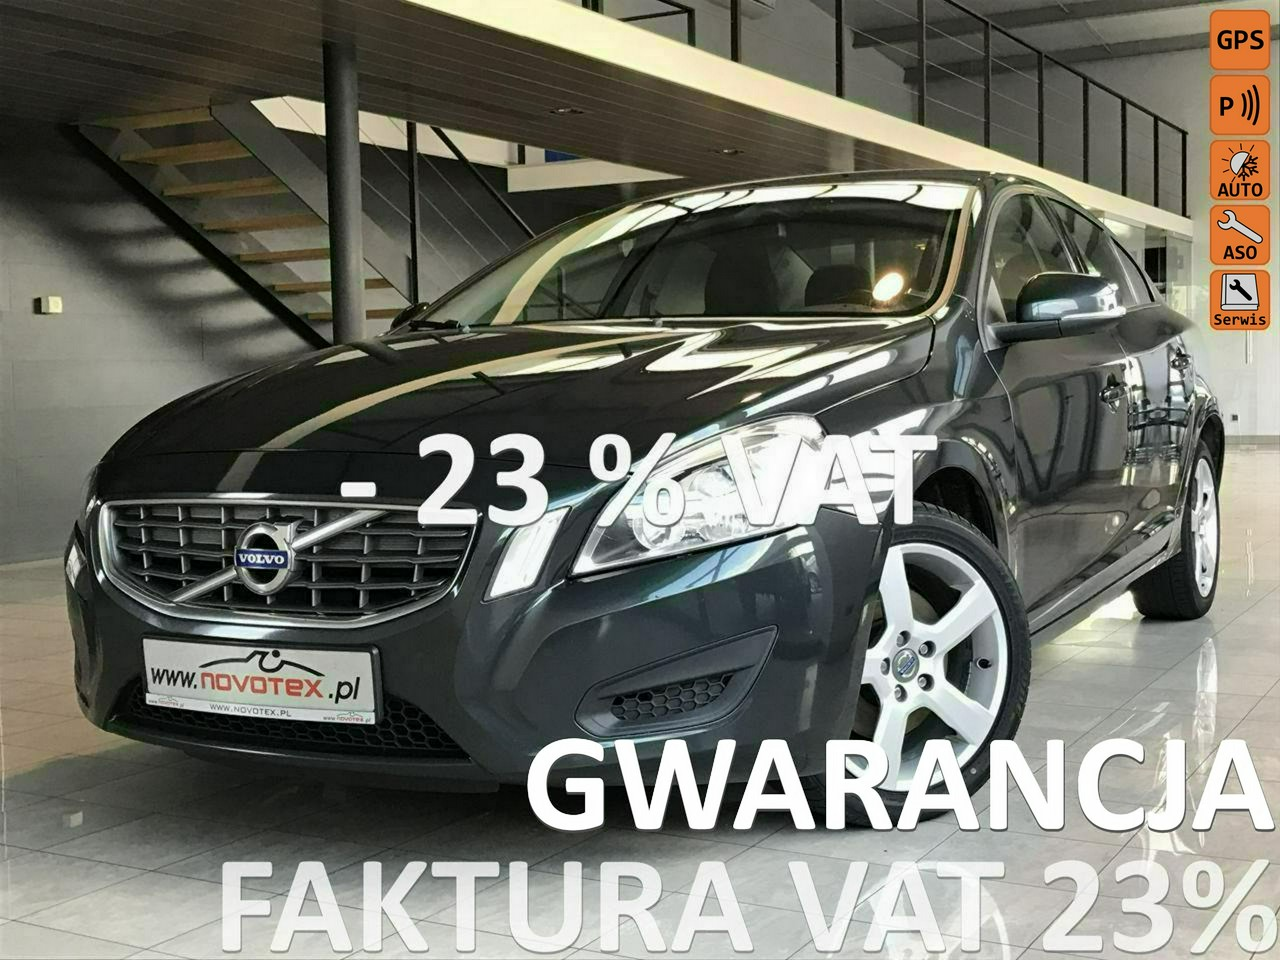 Volvo S60 D2*Momentum*serwis w ASO*Gwarancja VIP Gwarant